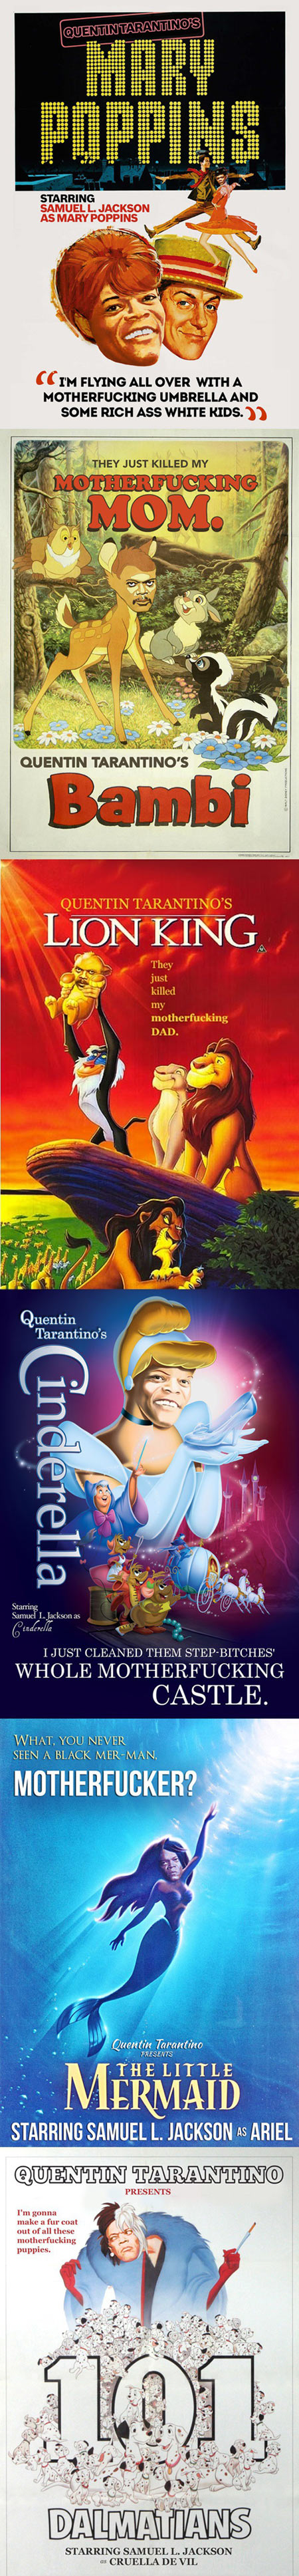 If Tarantino wrote movies for Disney…